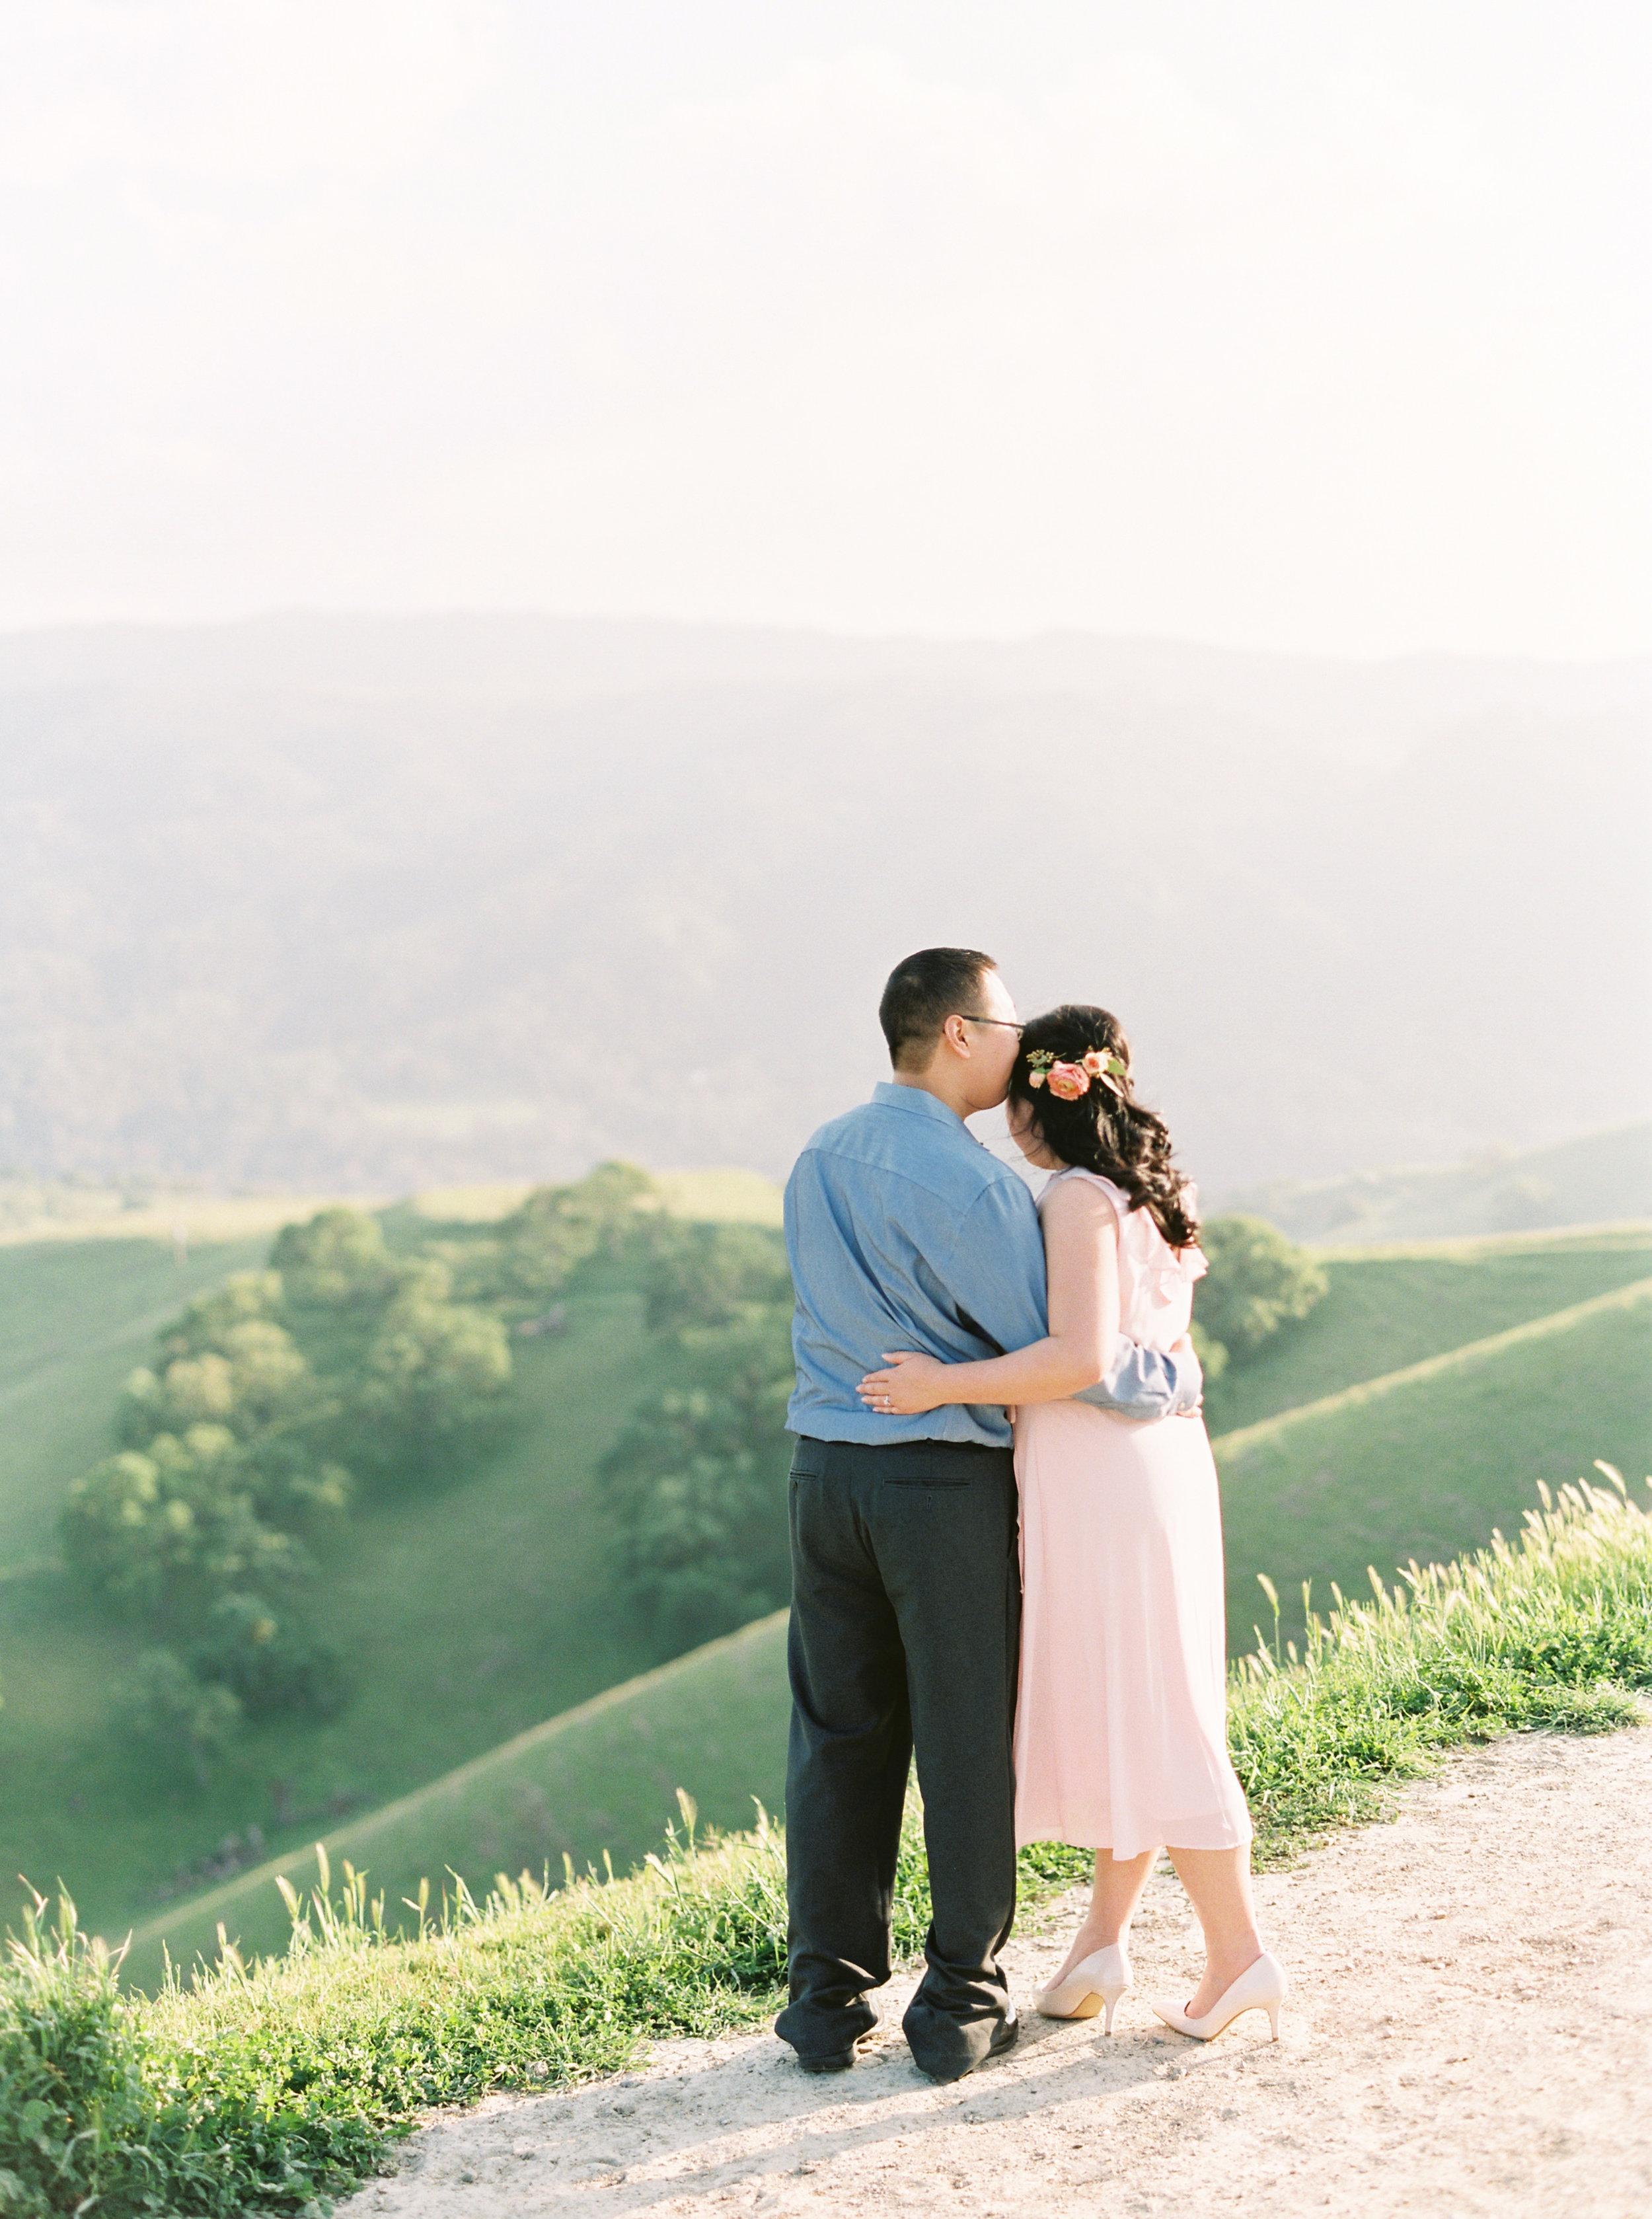 del-valle-livermore-bay-area-wedding-photographer-4.jpg